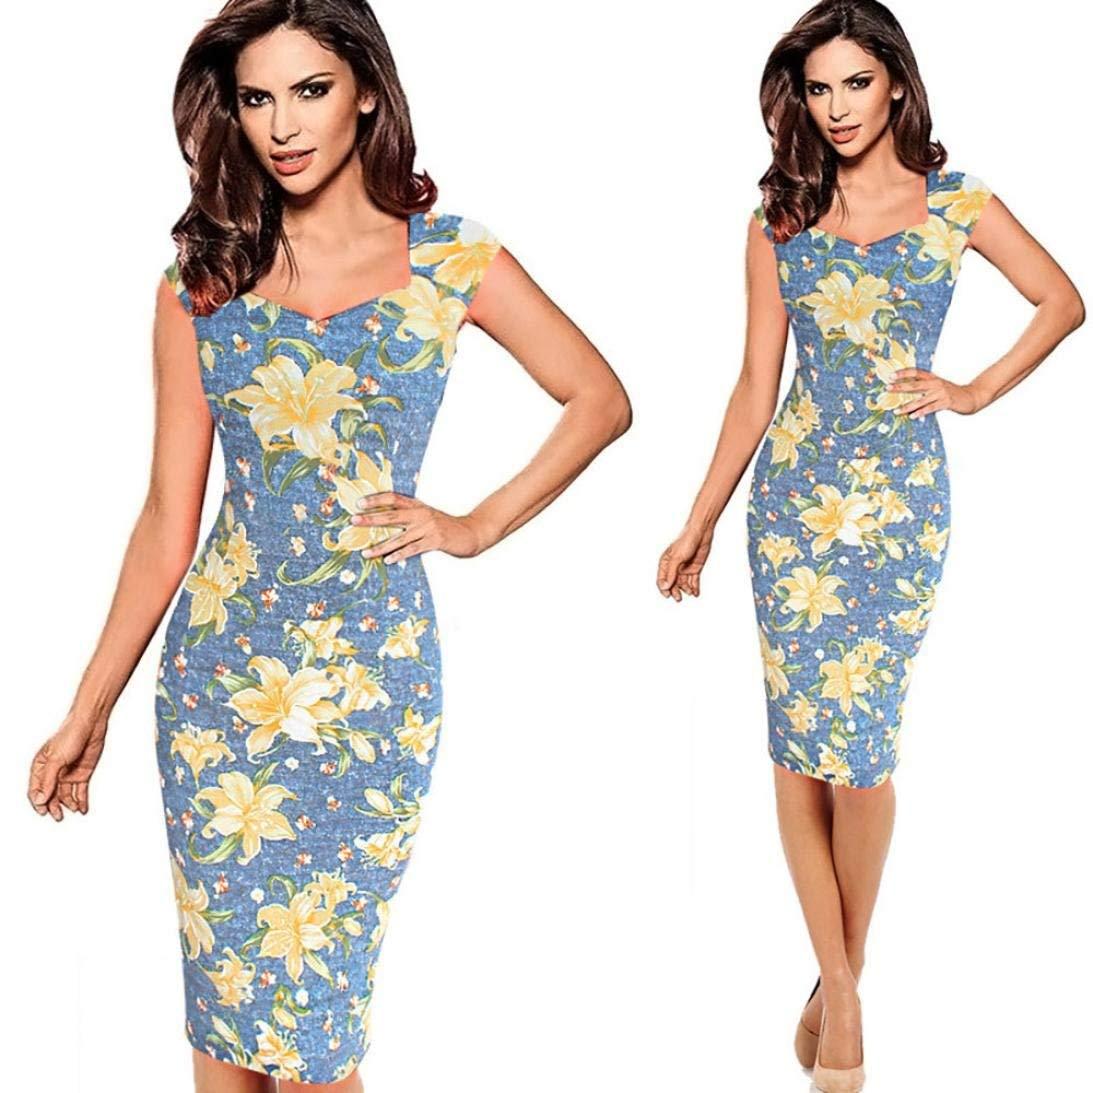 Clearance,Hatoppy Fashion Womens Pregnants Off Shoulder Ruffles Solid Nursing Maternity Dress (L2, Blue)